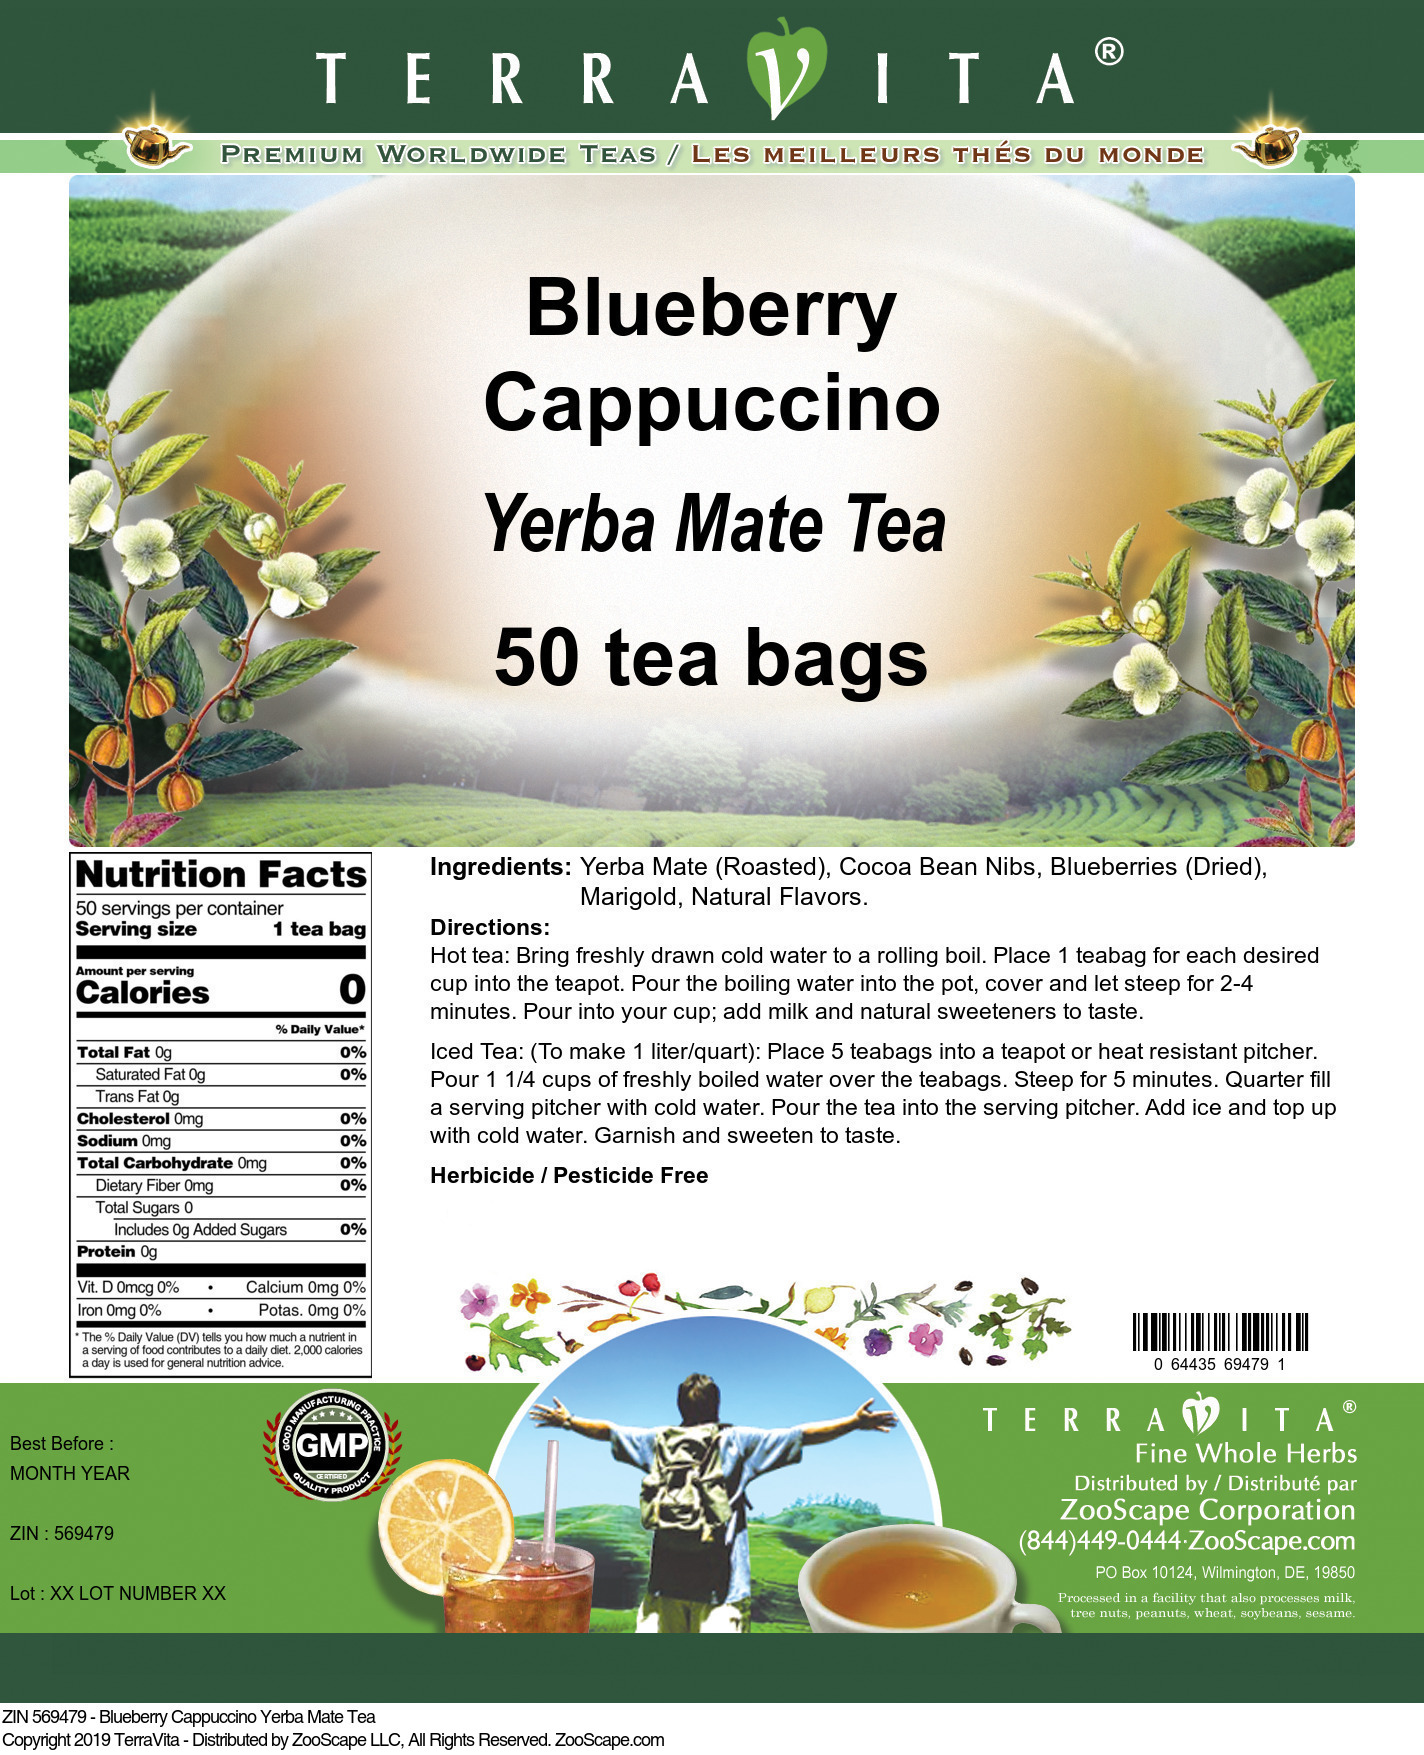 Blueberry Cappuccino Yerba Mate